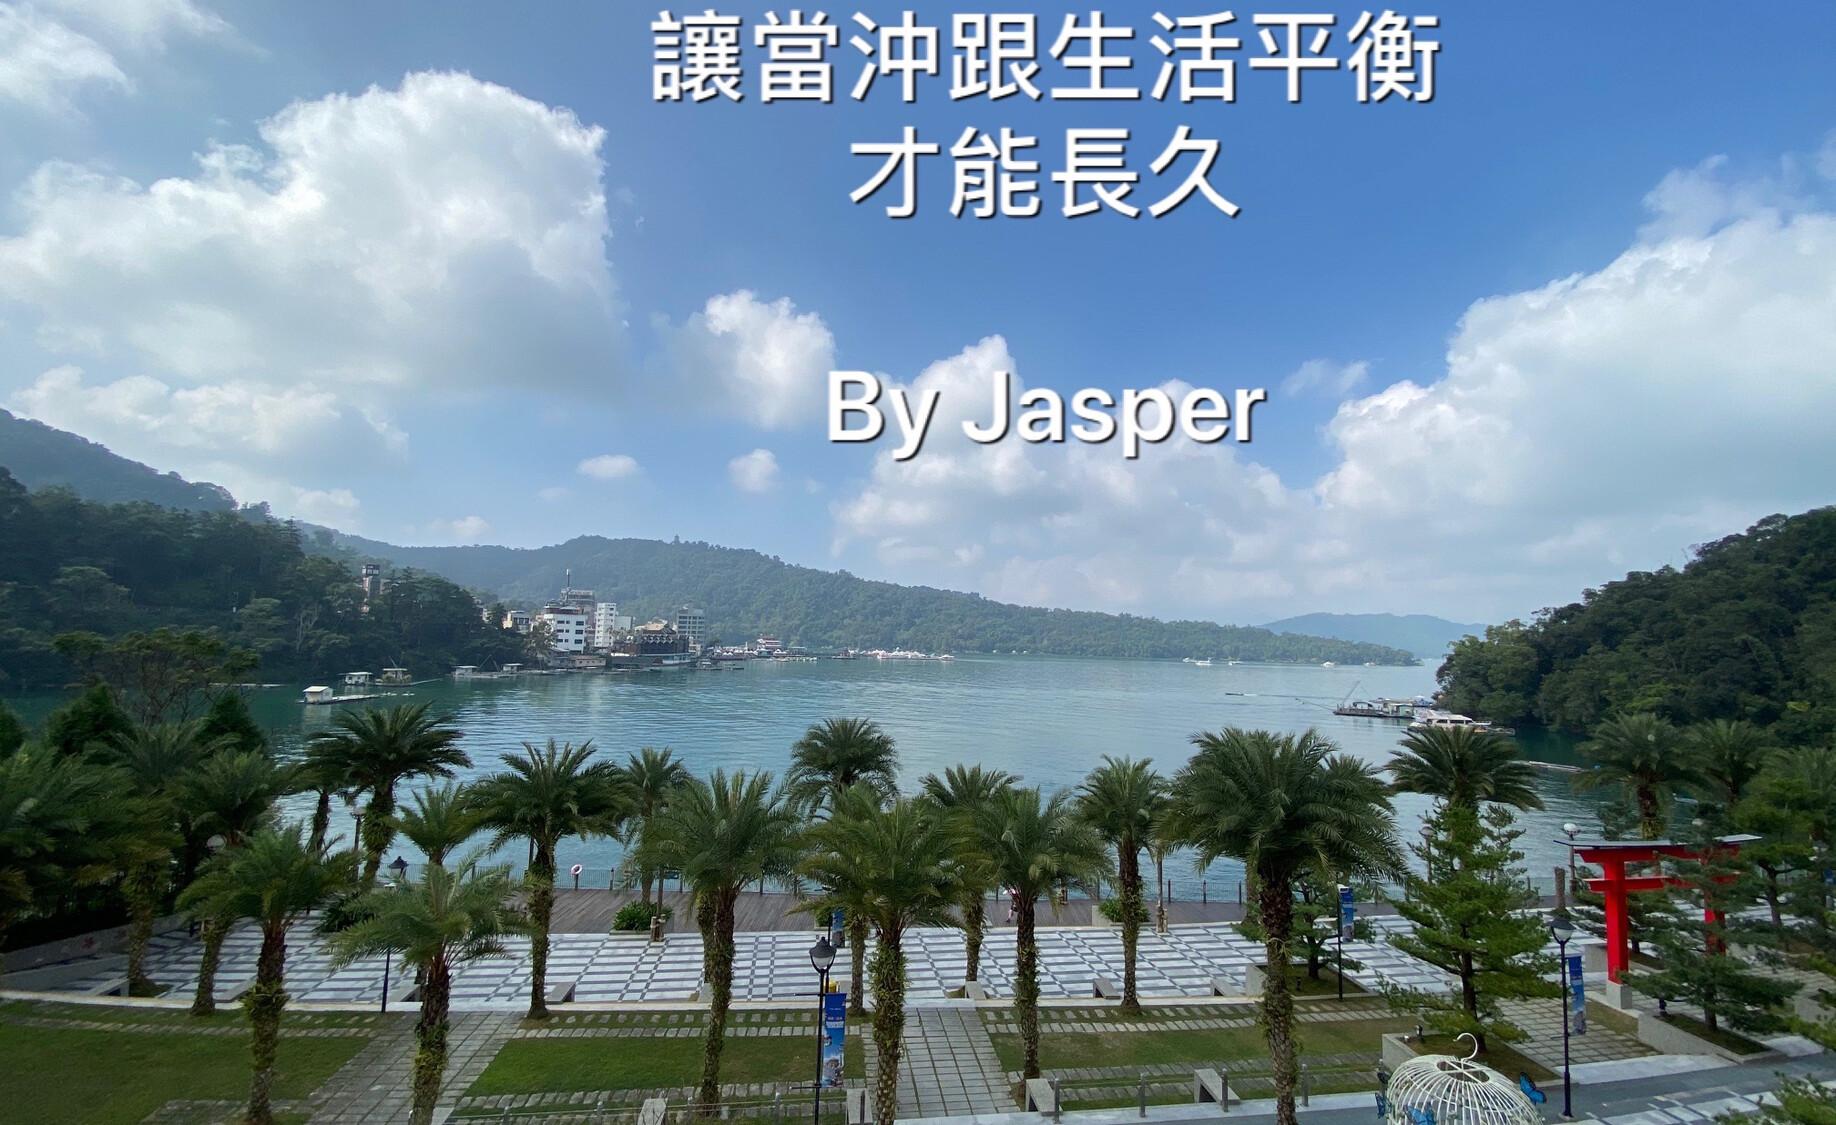 Jasper的手機當沖世界 - 高勝率的實戰影片教學